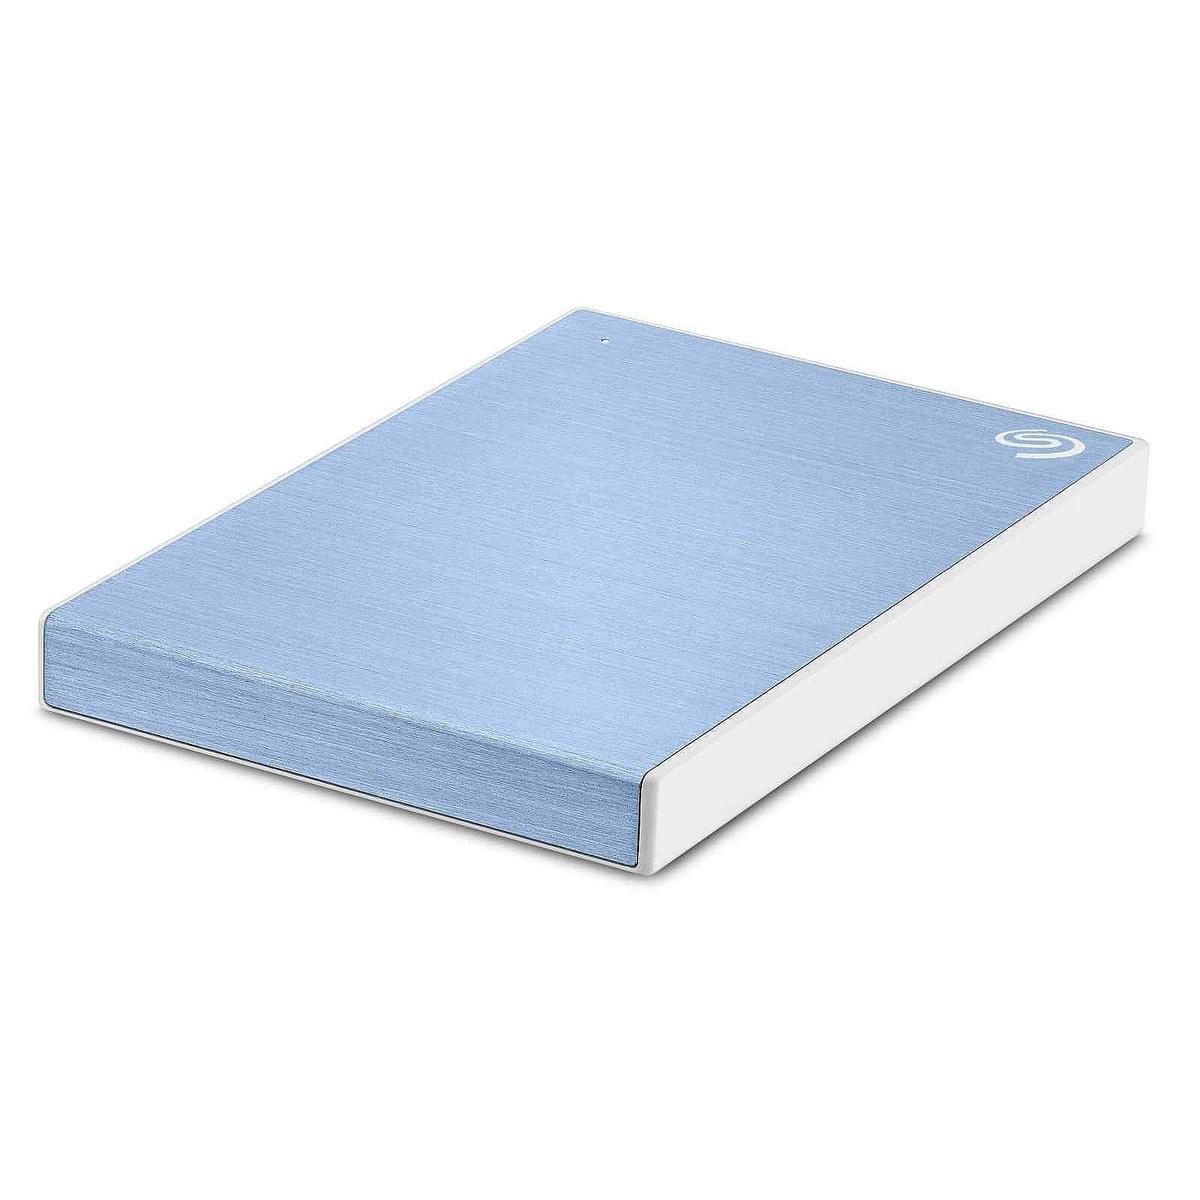 1 ТБ Внешний жесткий диск Seagate Backup Plus Slim (STHN1000402), голубой #1